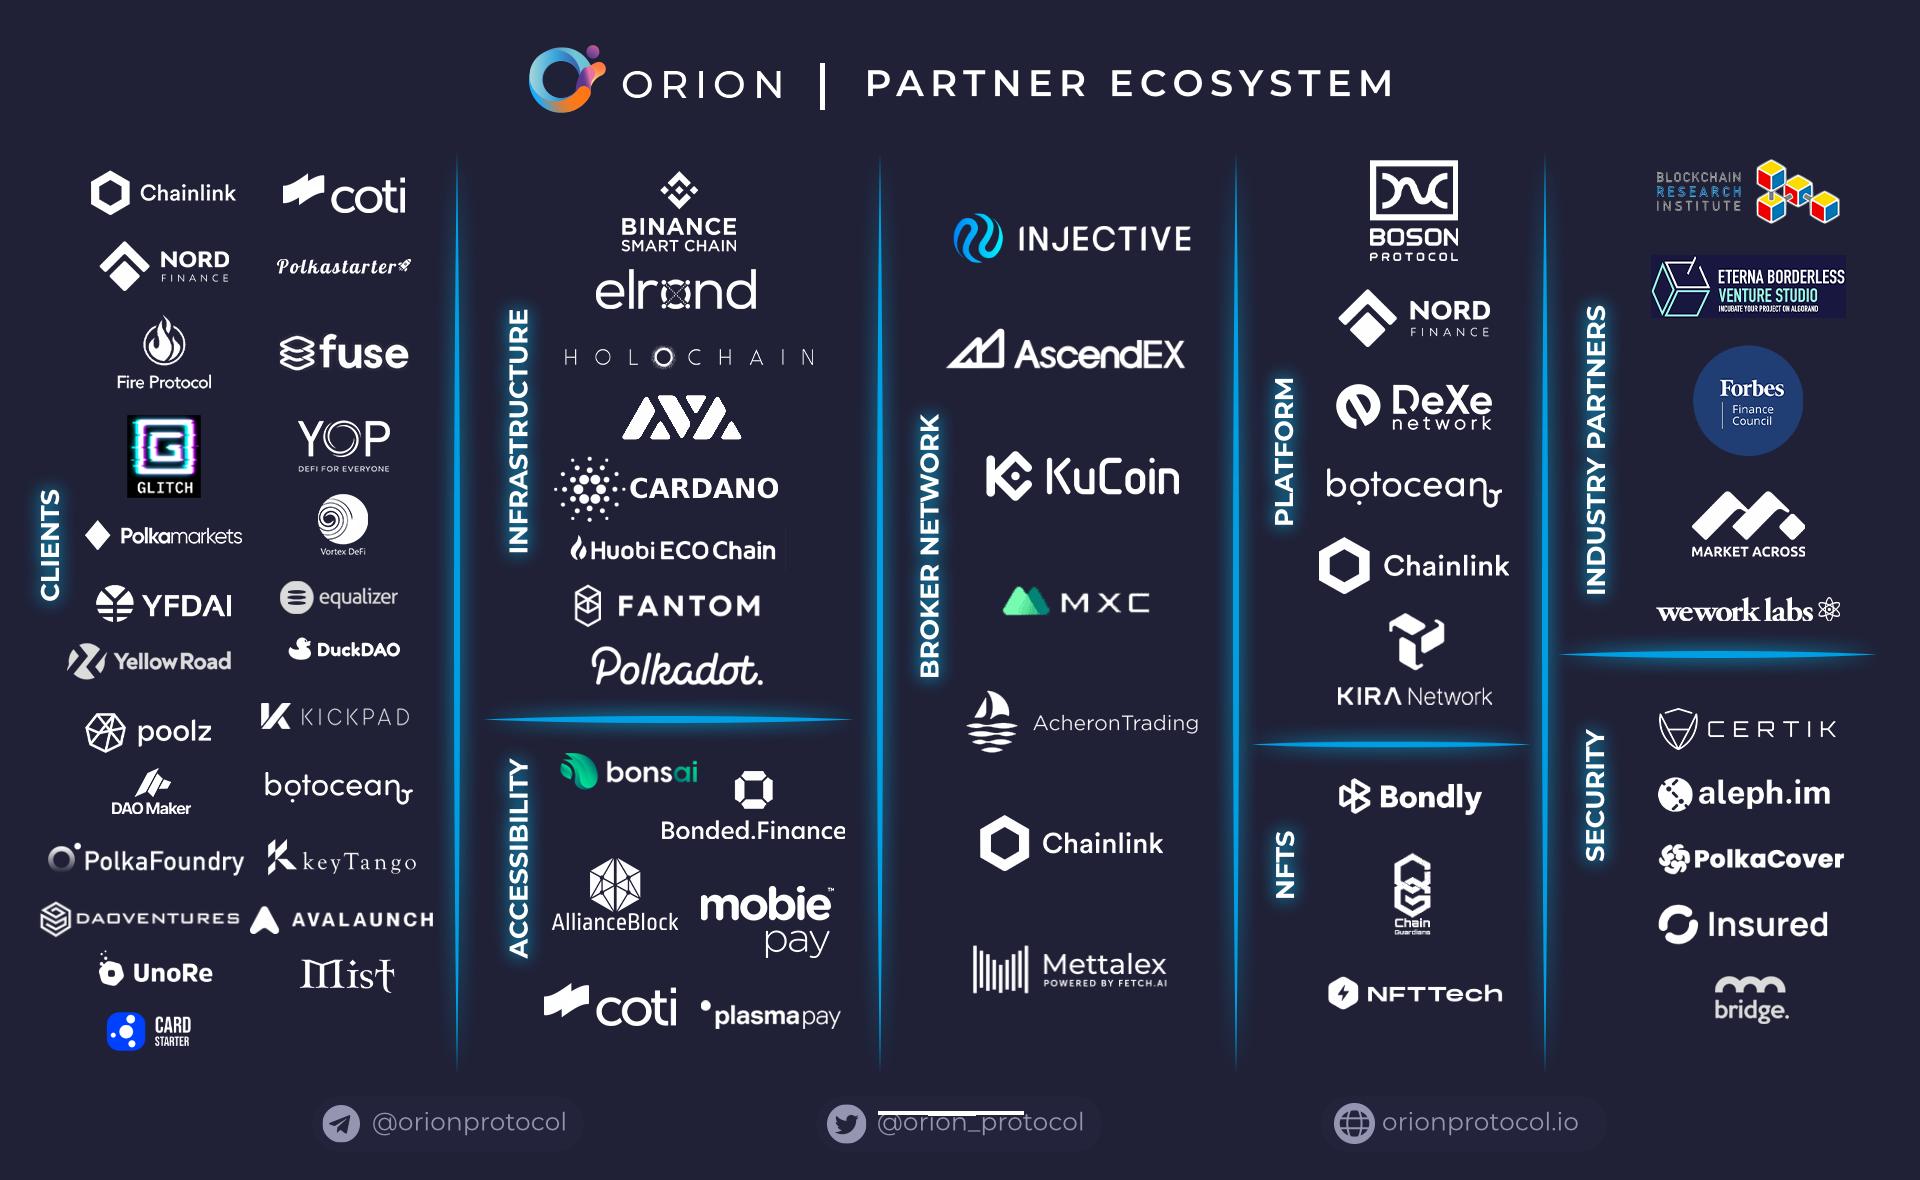 Partners: Explained